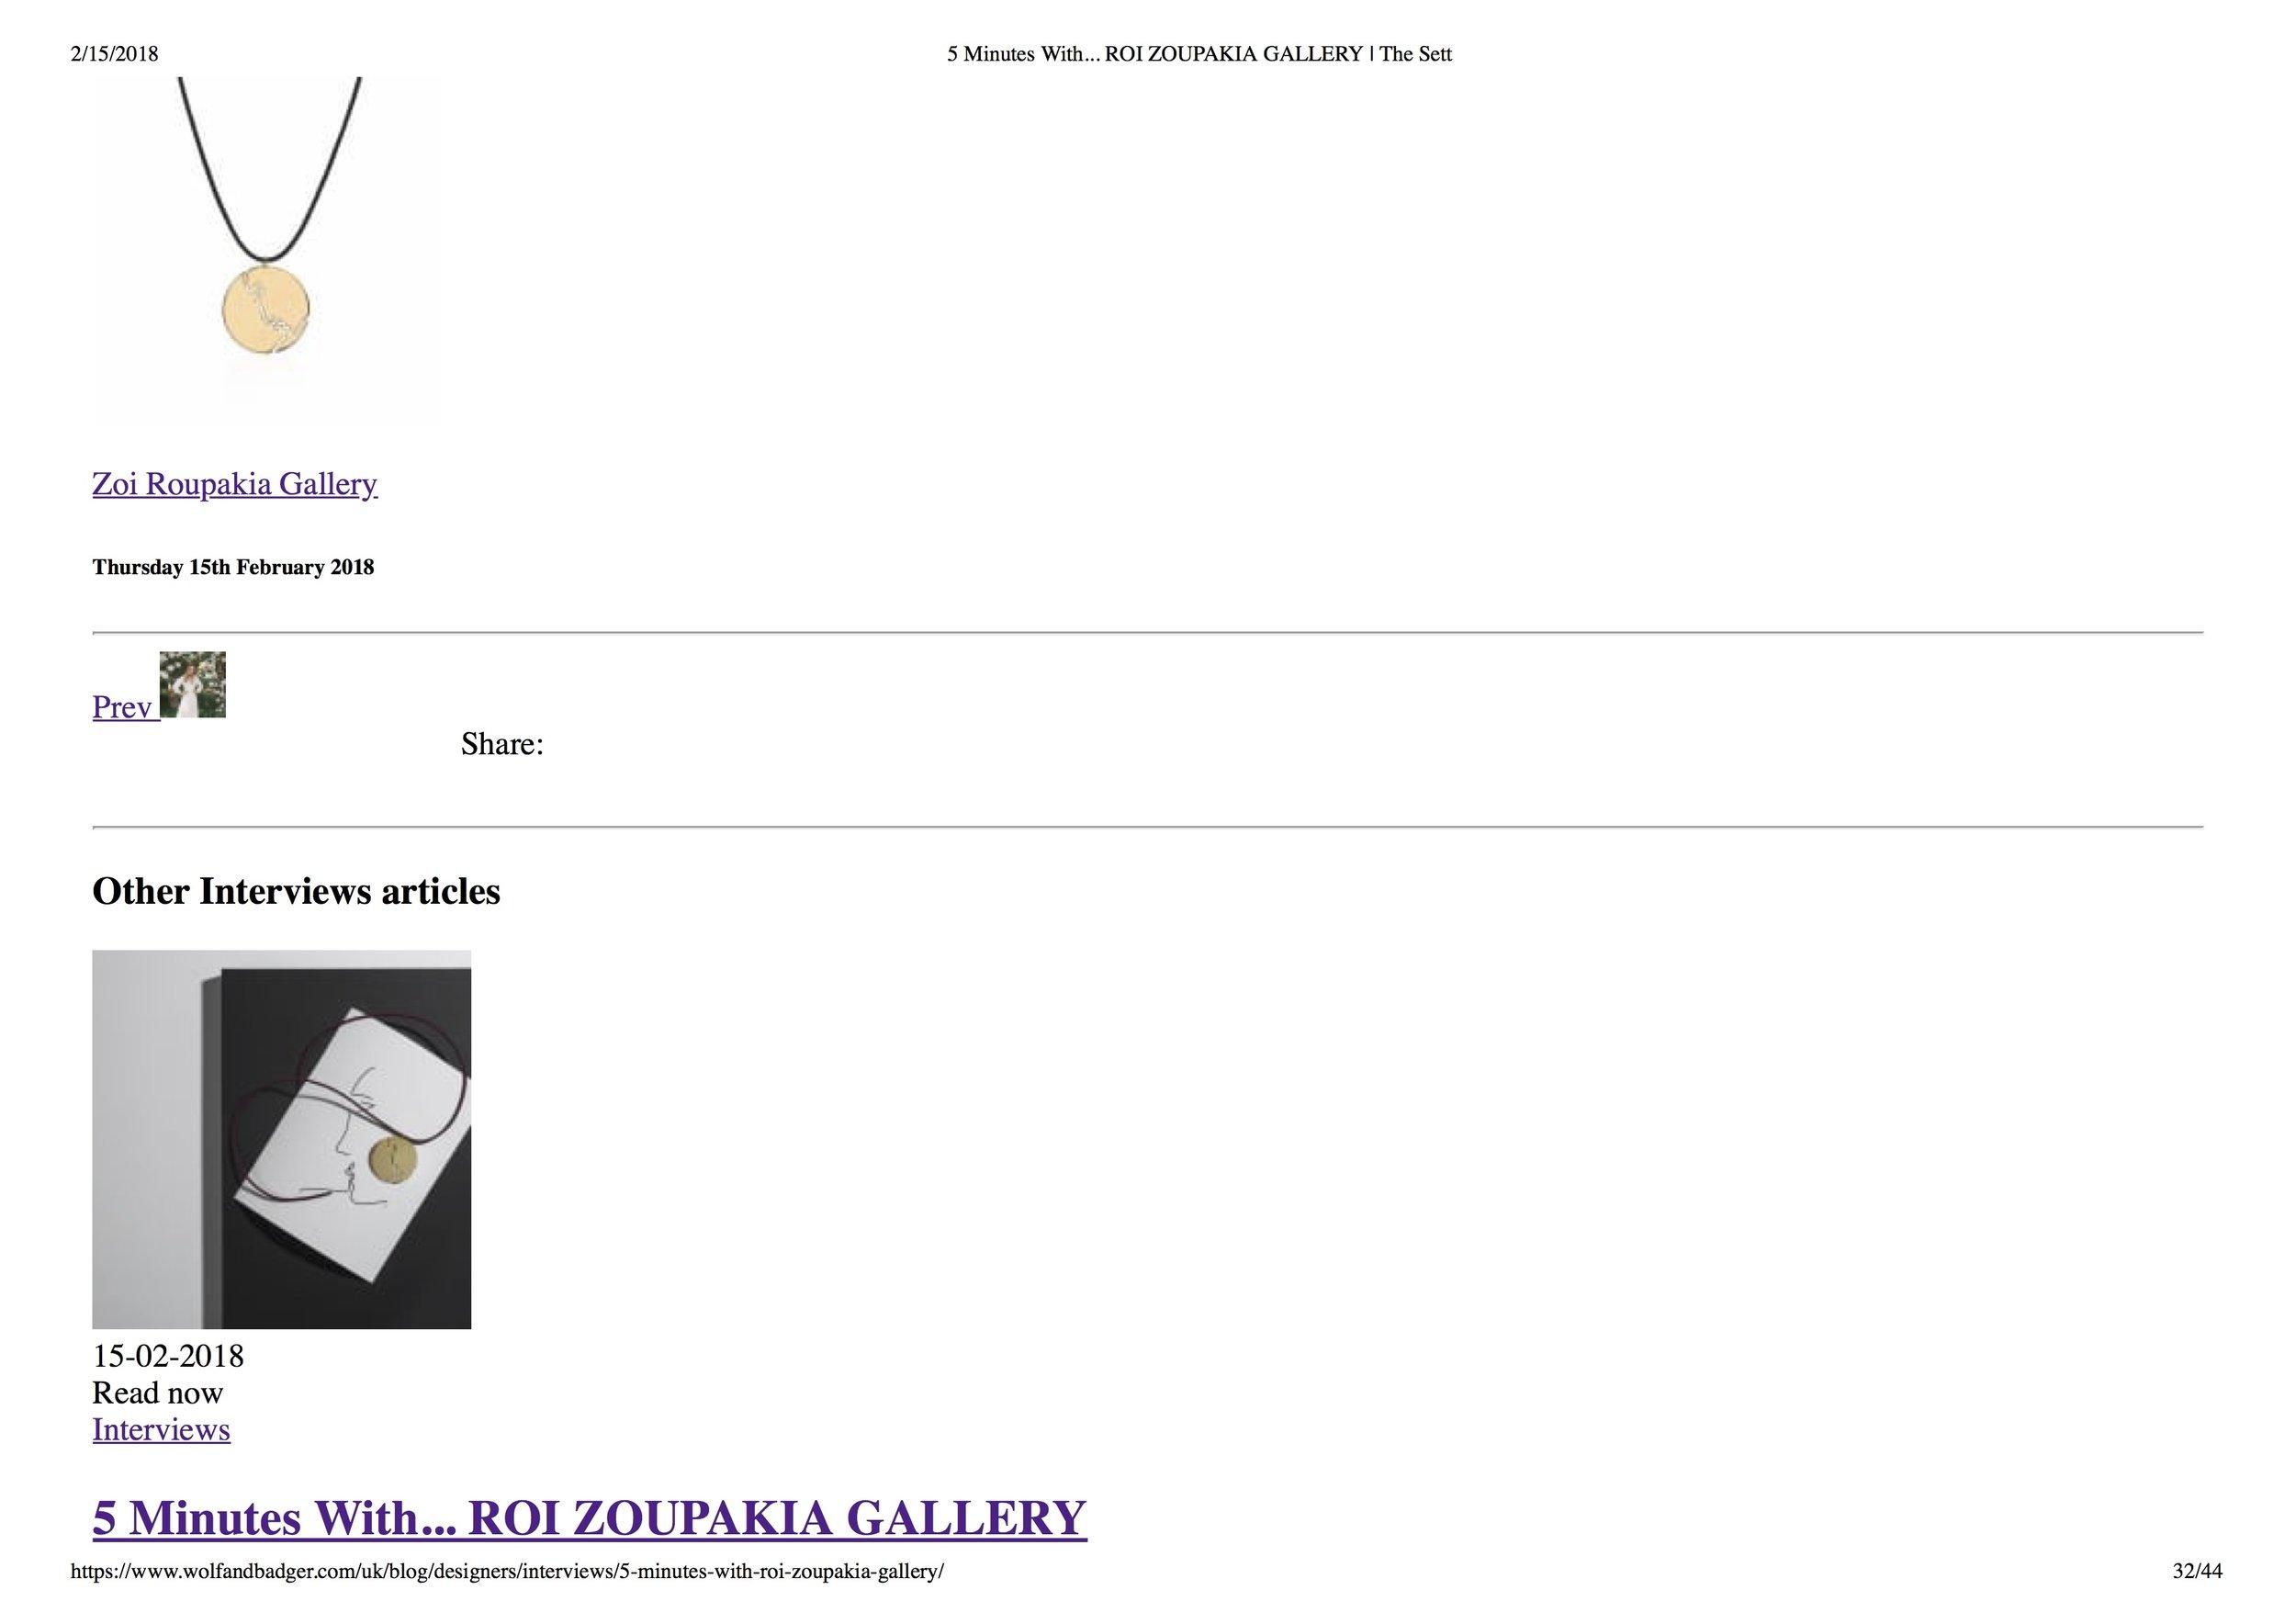 11.5 Minutes With... ROI ZOUPAKIA GALLERY | The Sett.jpg